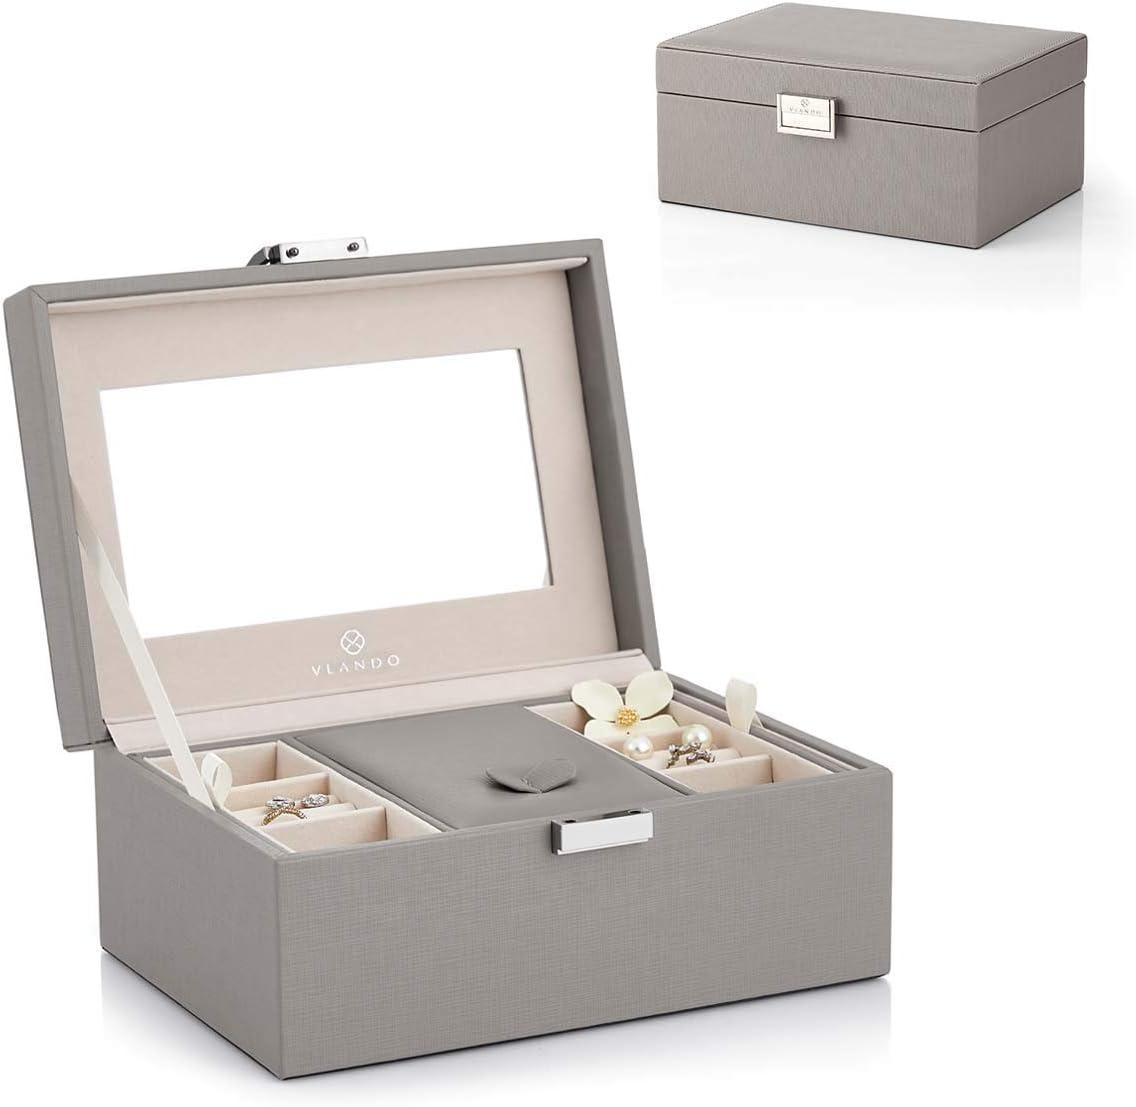 Vlando Jewerly Box VJ16002 (Updated Grey)